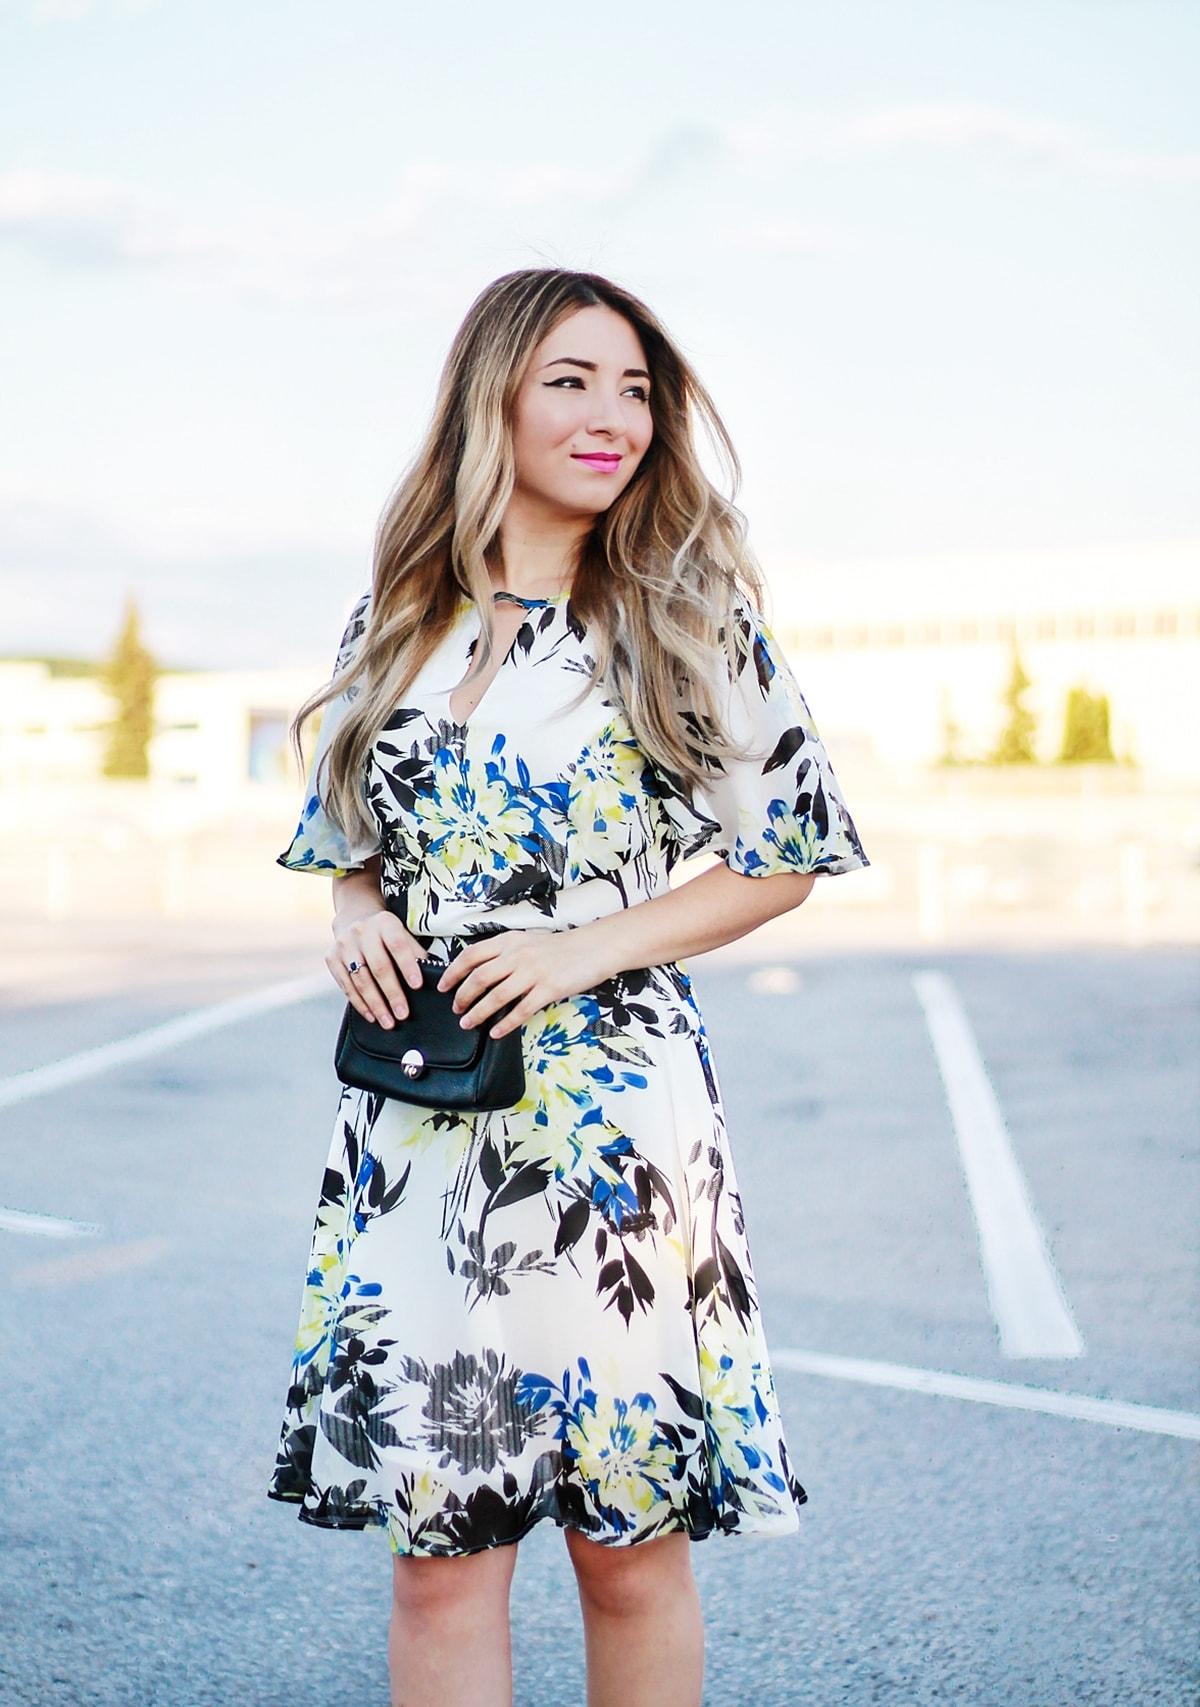 Street style: floral print dress, white, black, blue and yellow, summer look, elegant, blogger, black bag, andreea ristea, fashion blogger